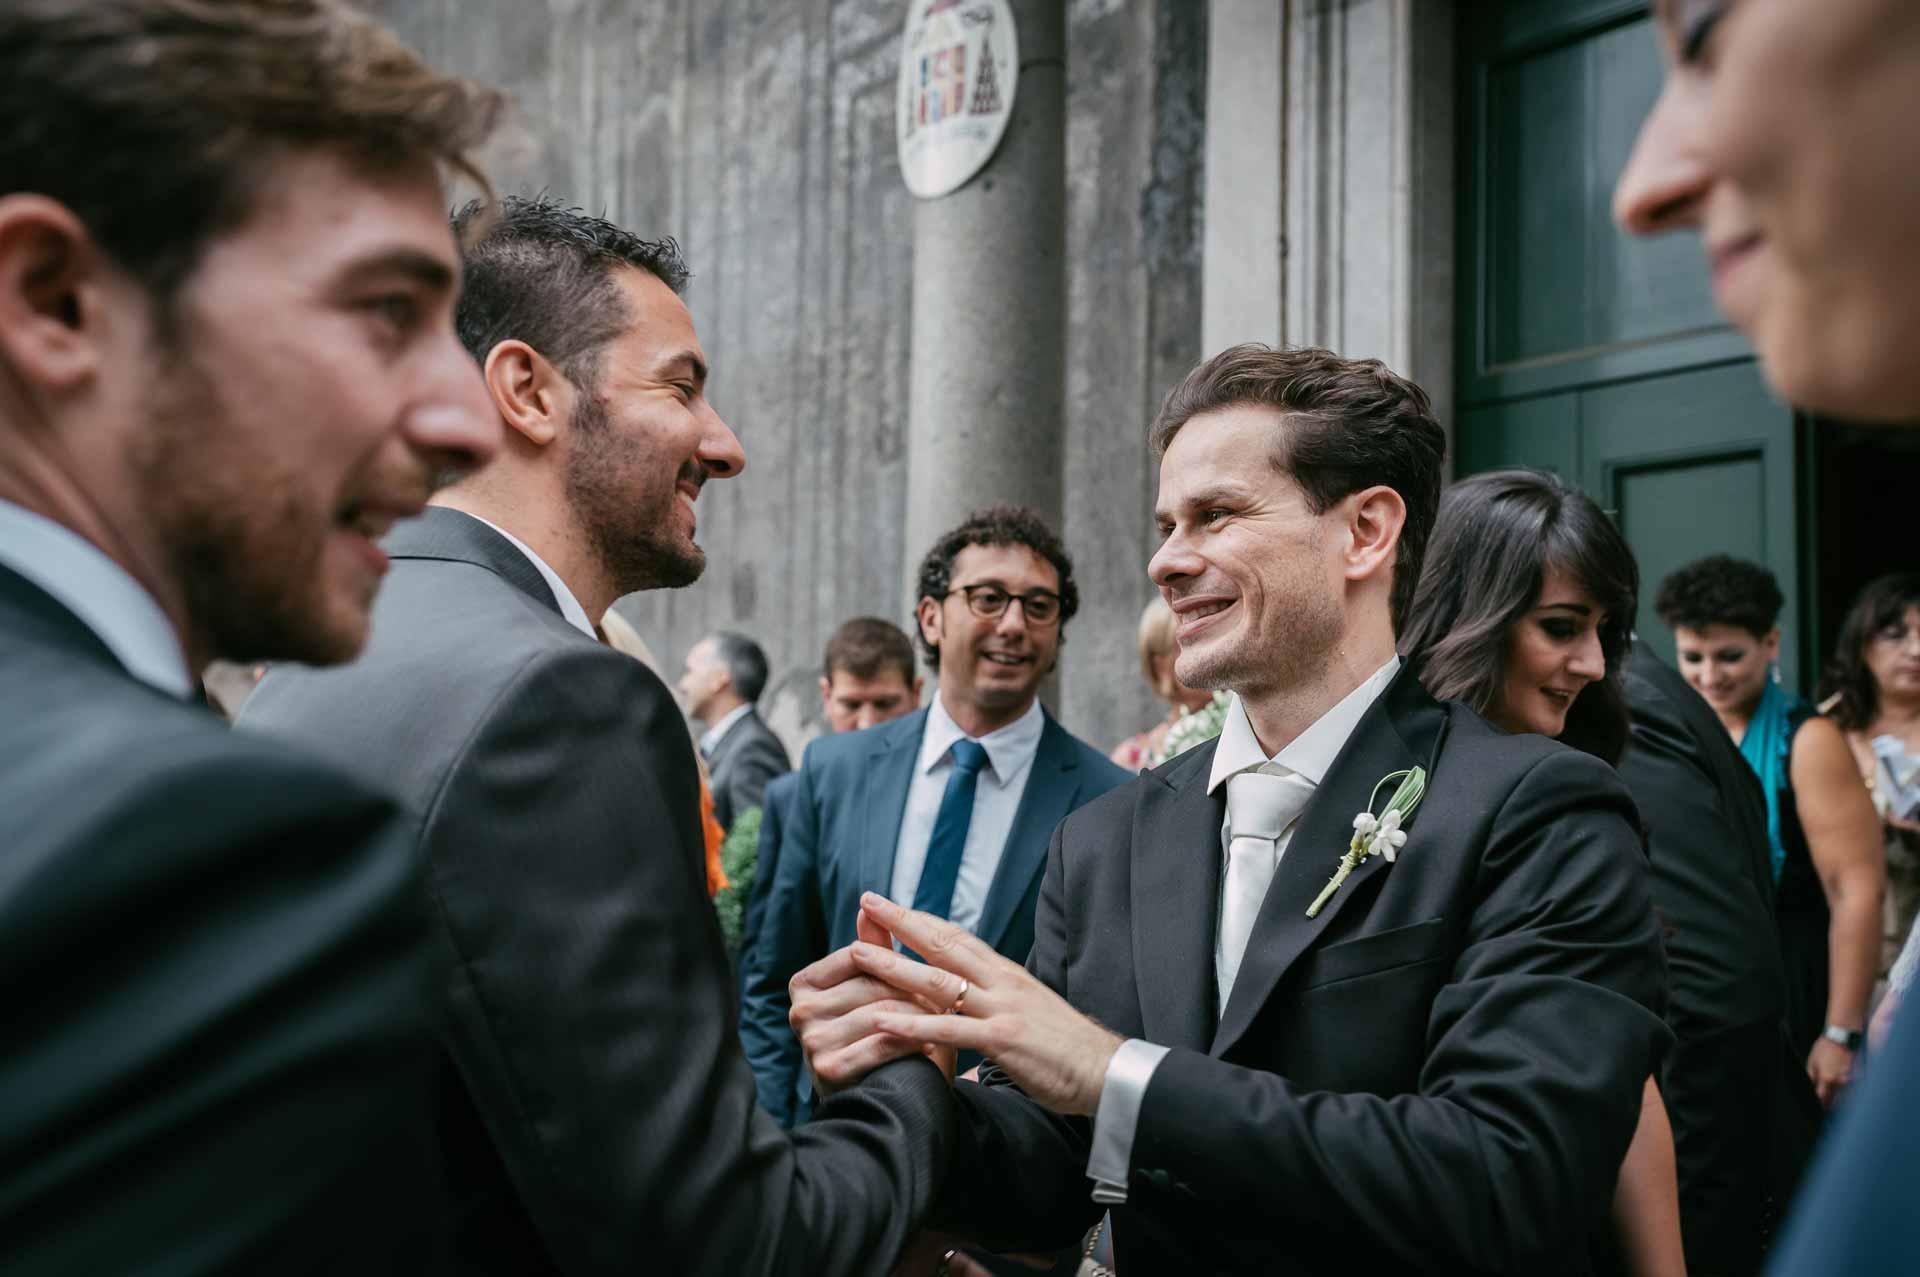 Fotografo-Matrimonio-Roma-Slide-i-57